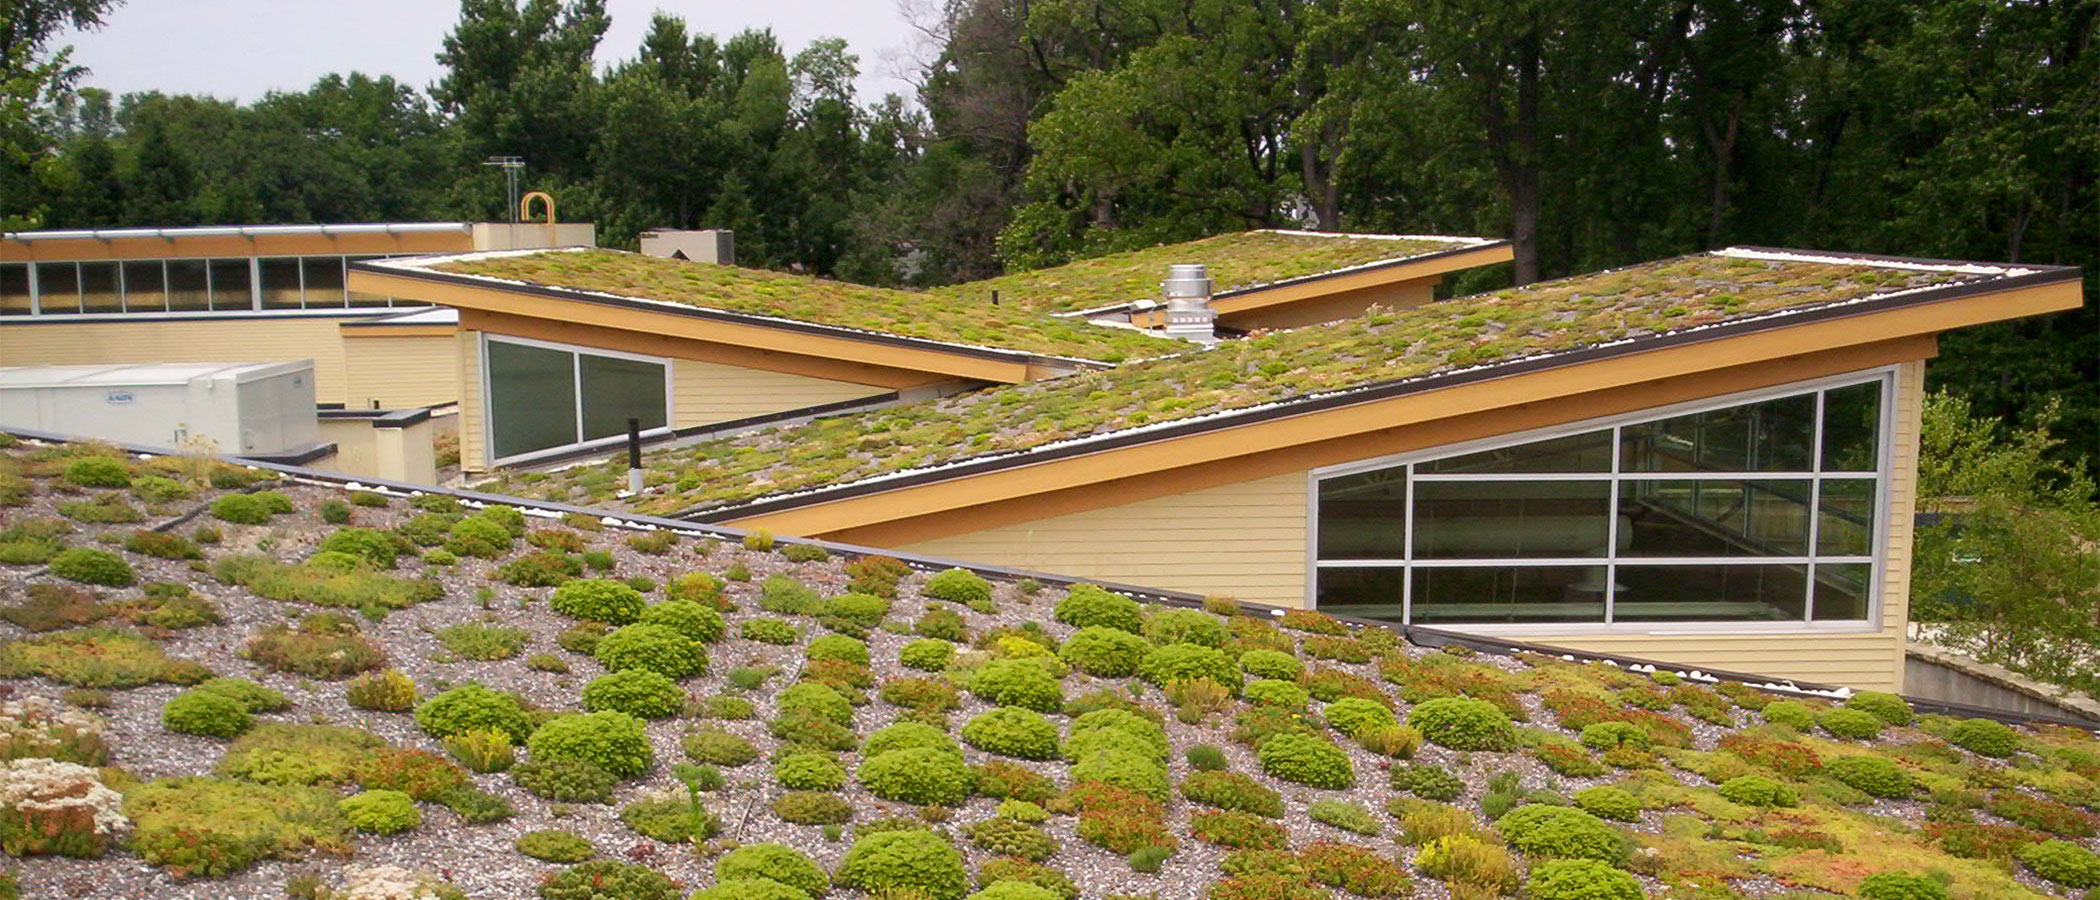 Green roof at Arlington's Walter Reed Community Center.